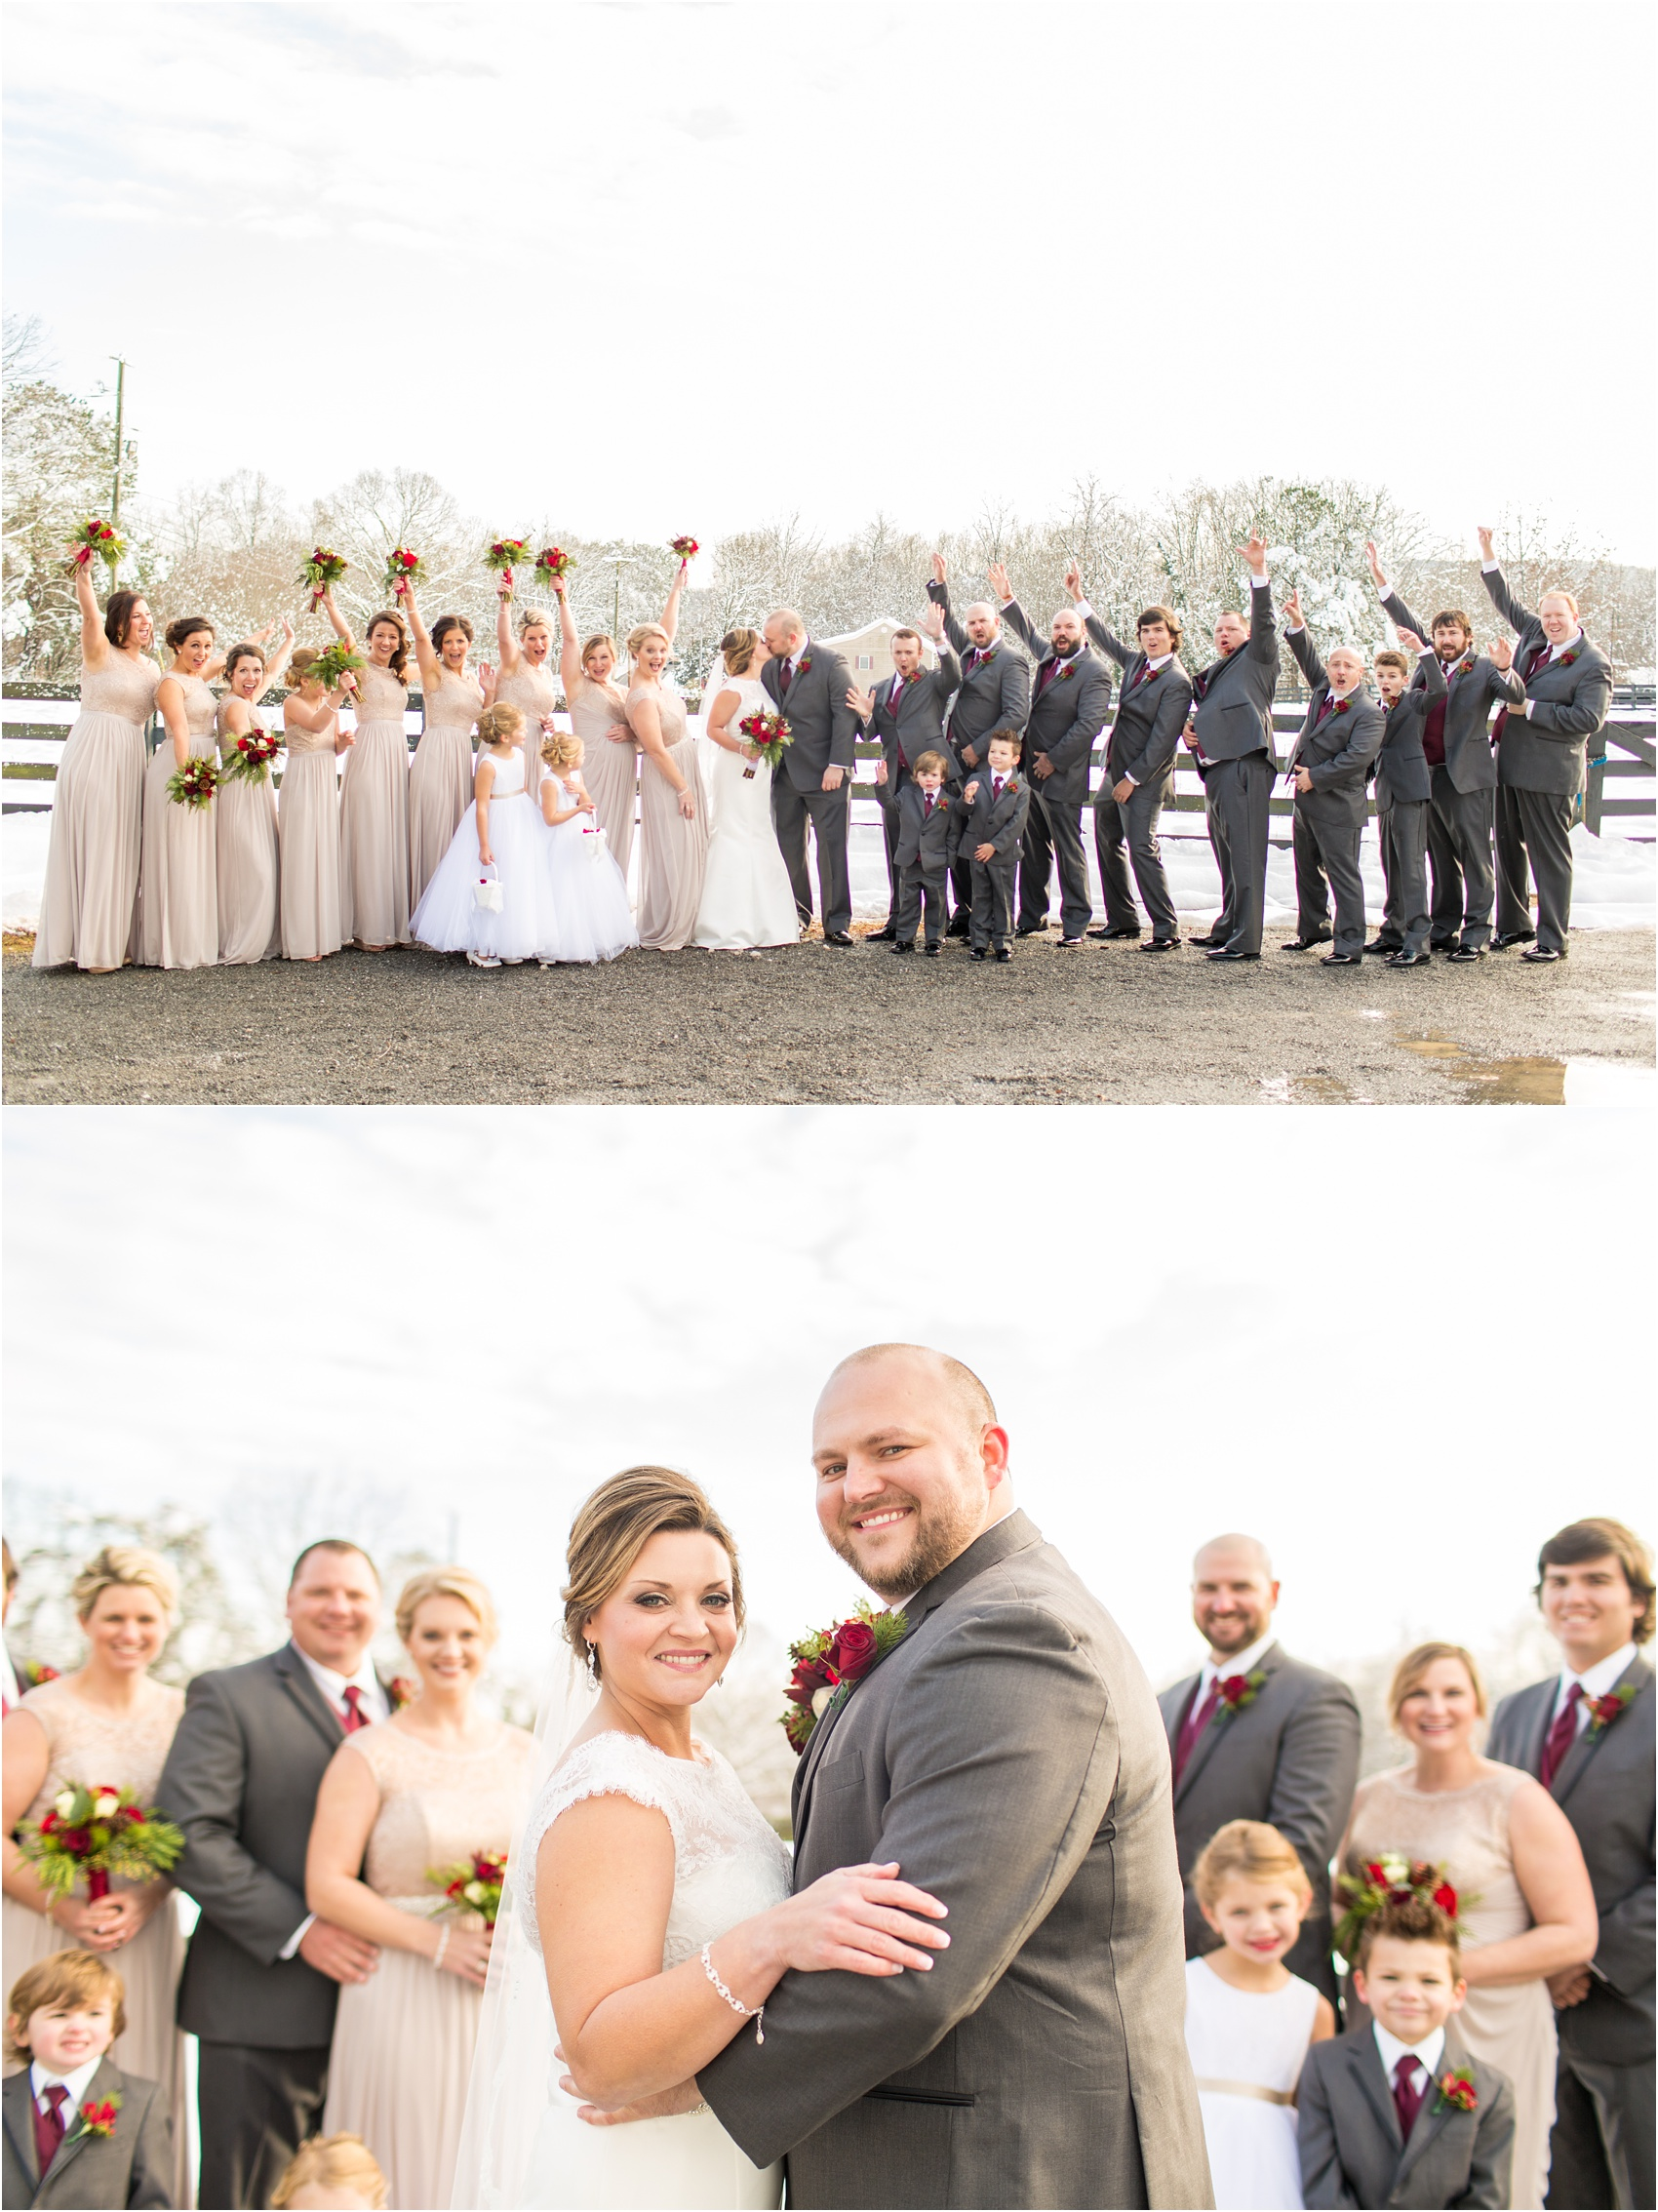 Savannah Eve Photography- Page Wedding Blog-56.jpg